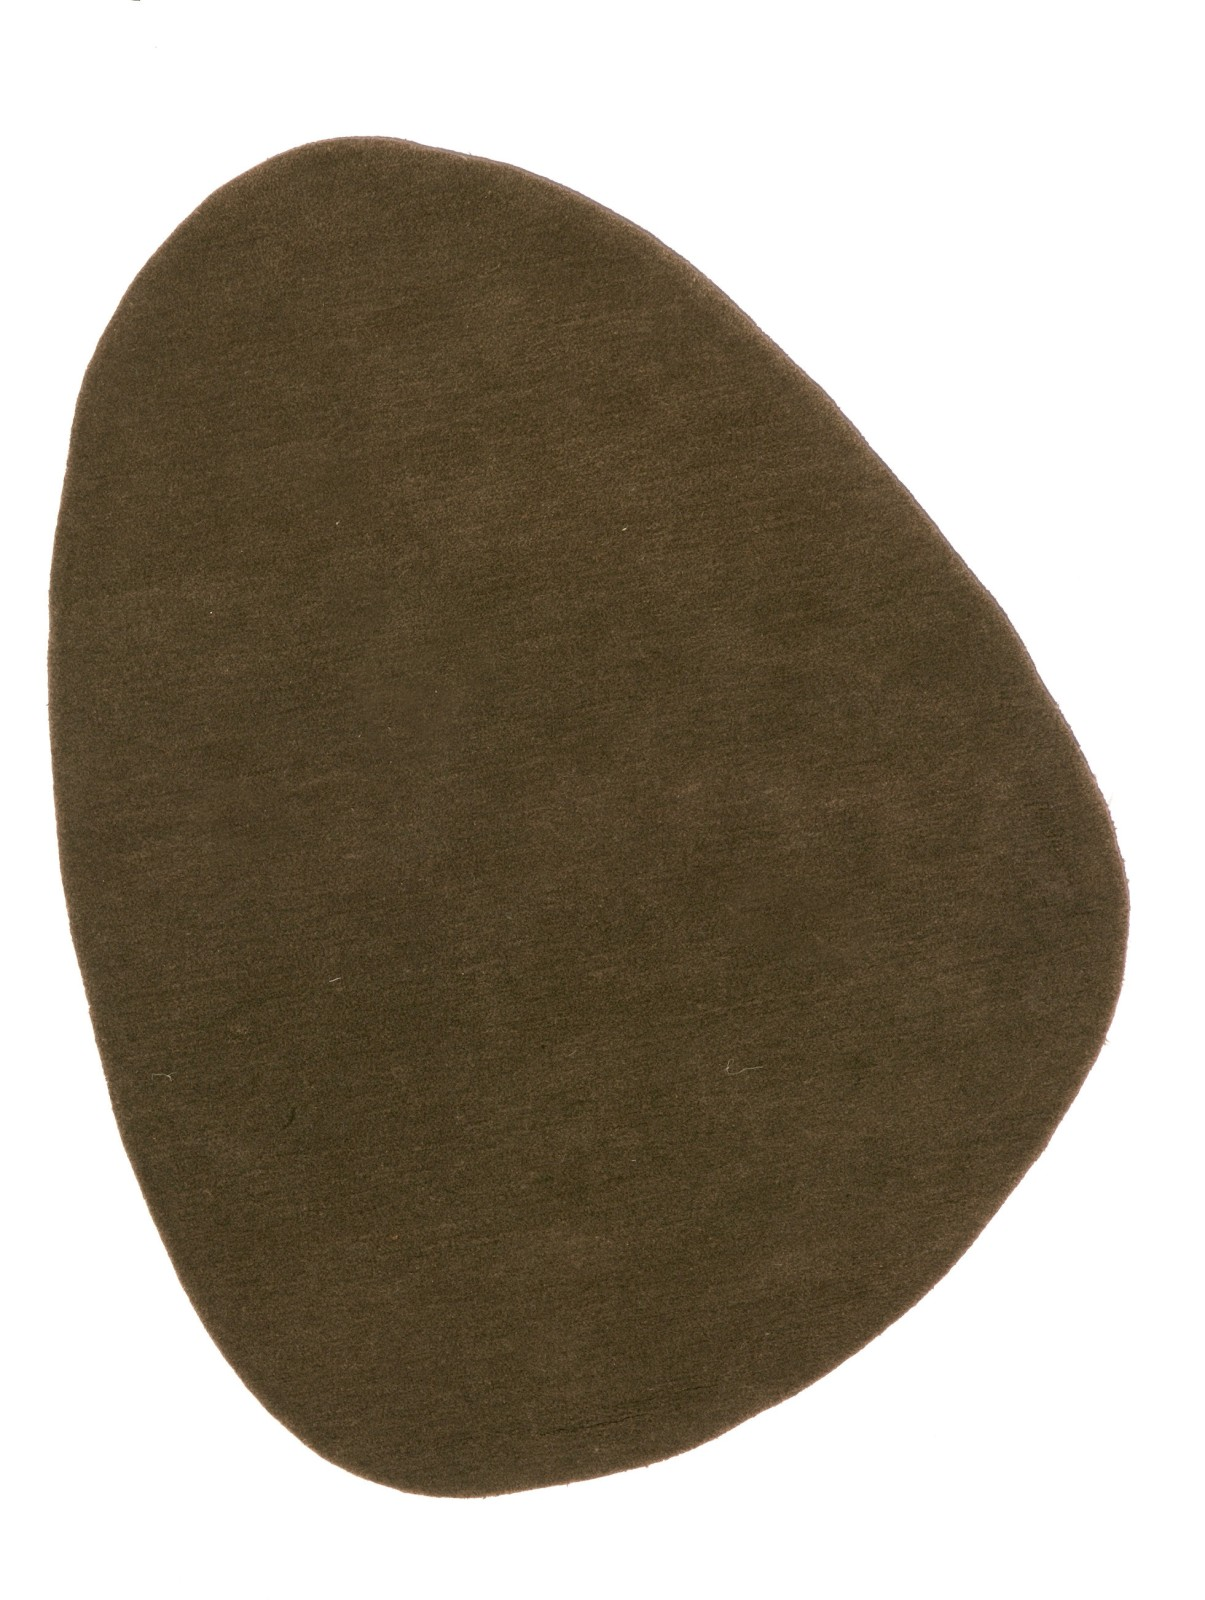 Stone 4 Wool